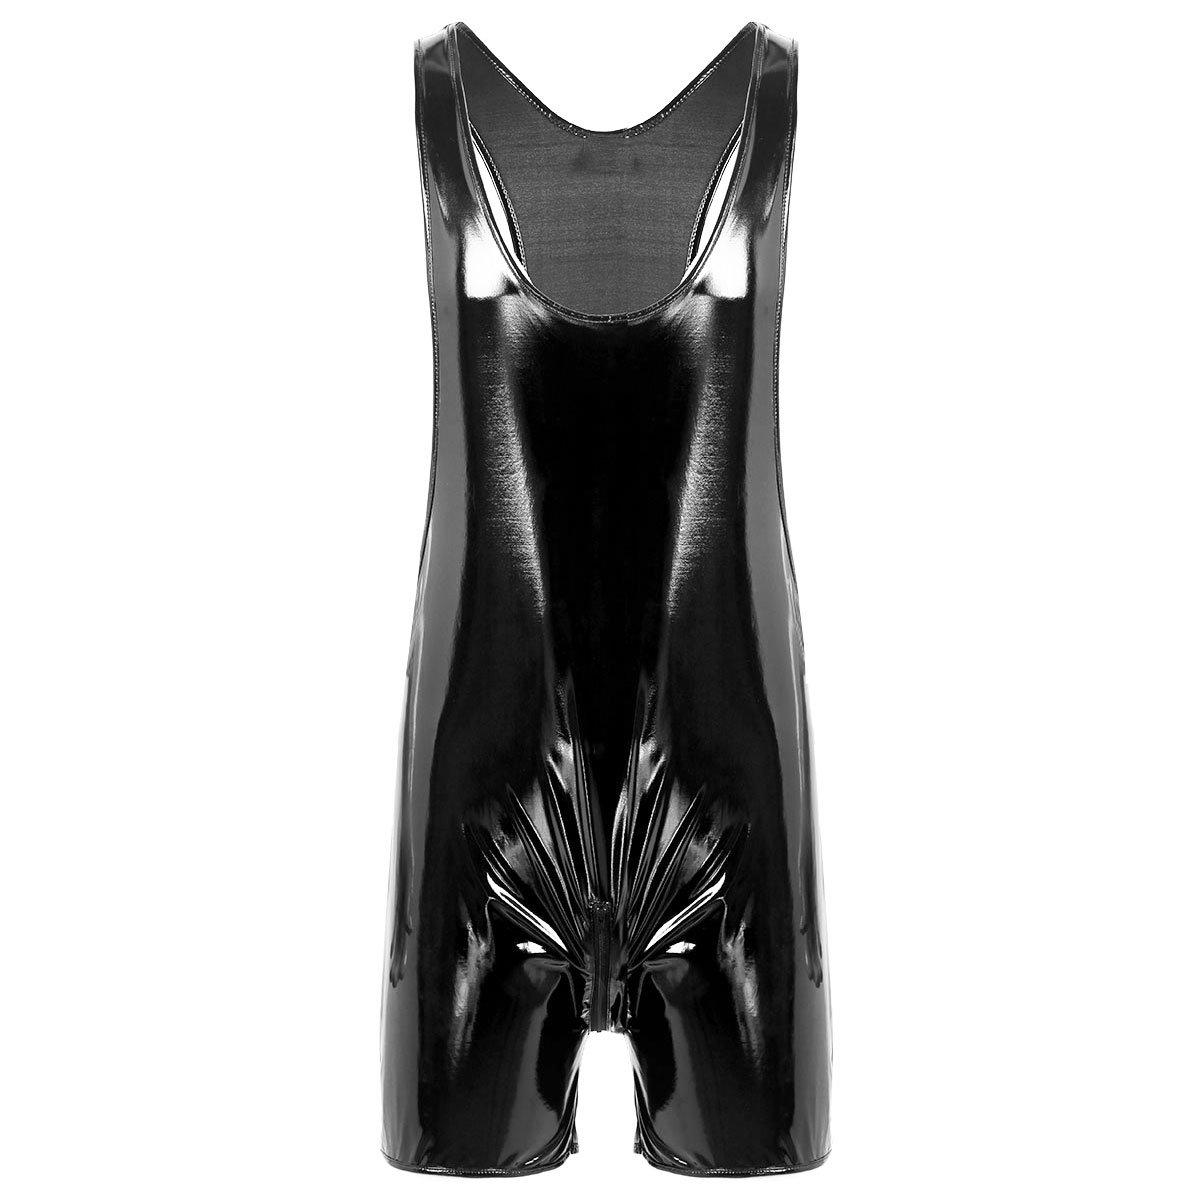 FEESHOW Mens Wet Look PVC Leather Butcher Zipper Crotch Romper Bodysuit Clubwear Black Large